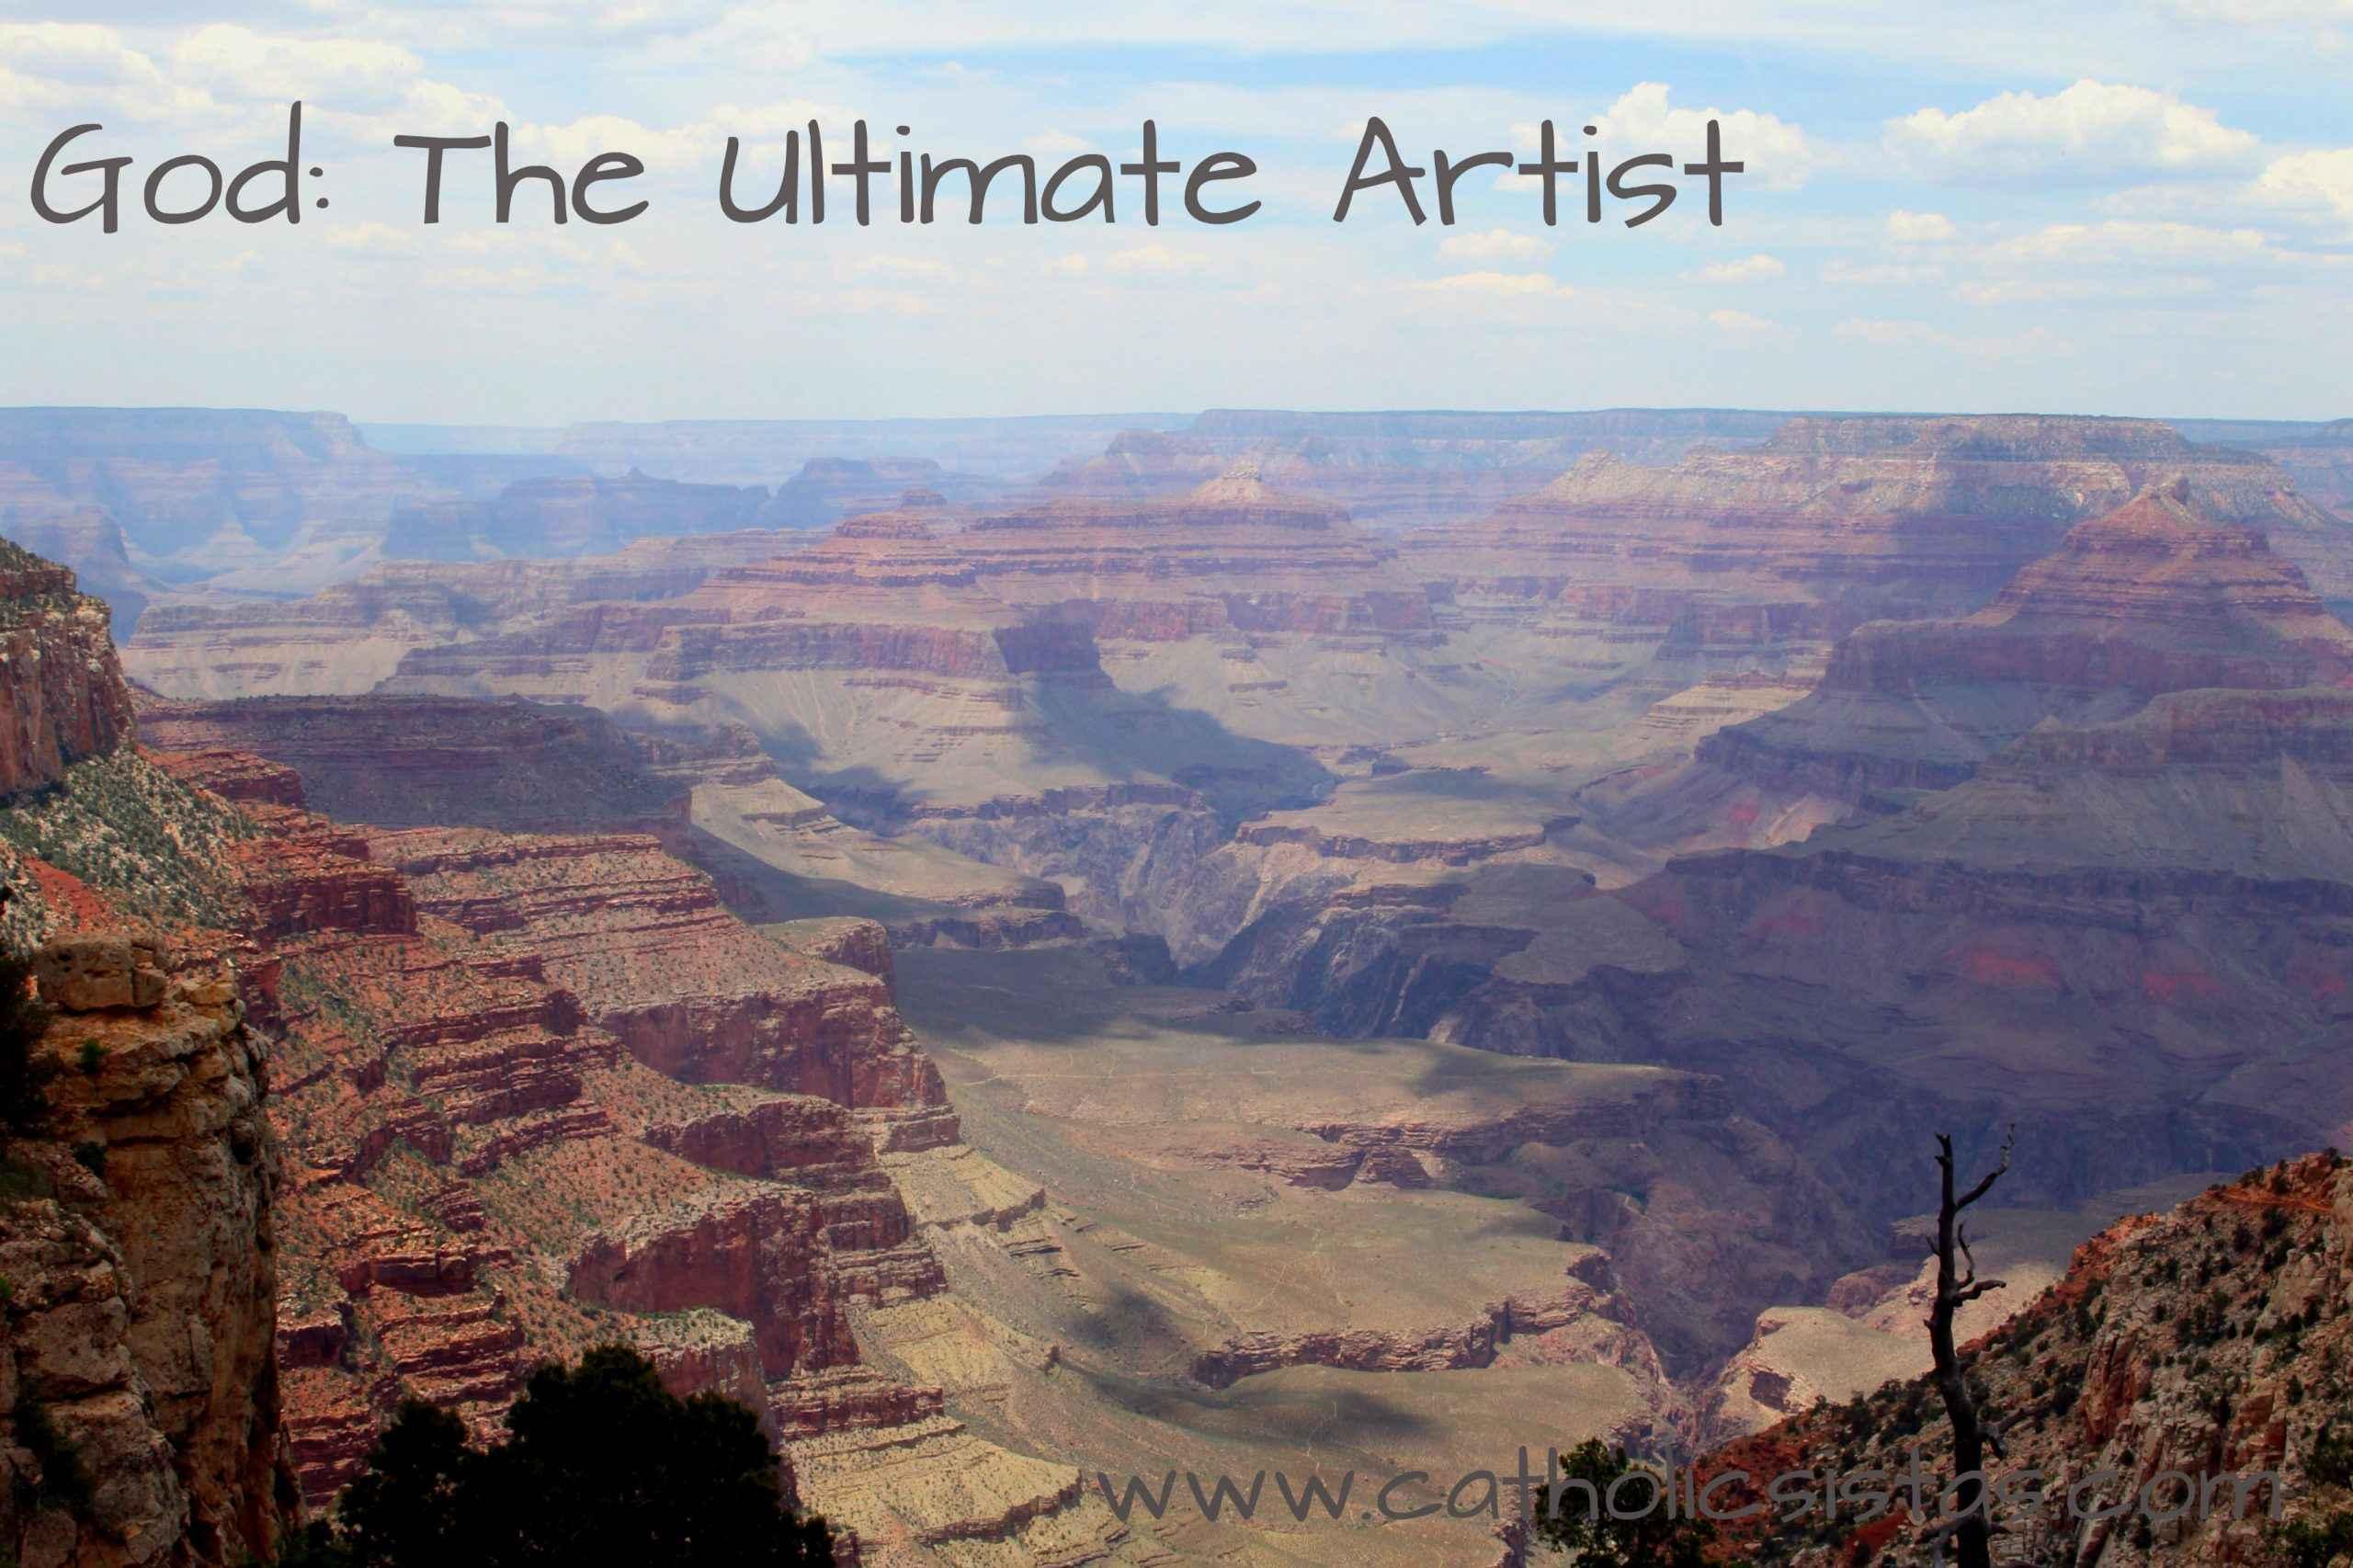 God: The Ultimate Artist